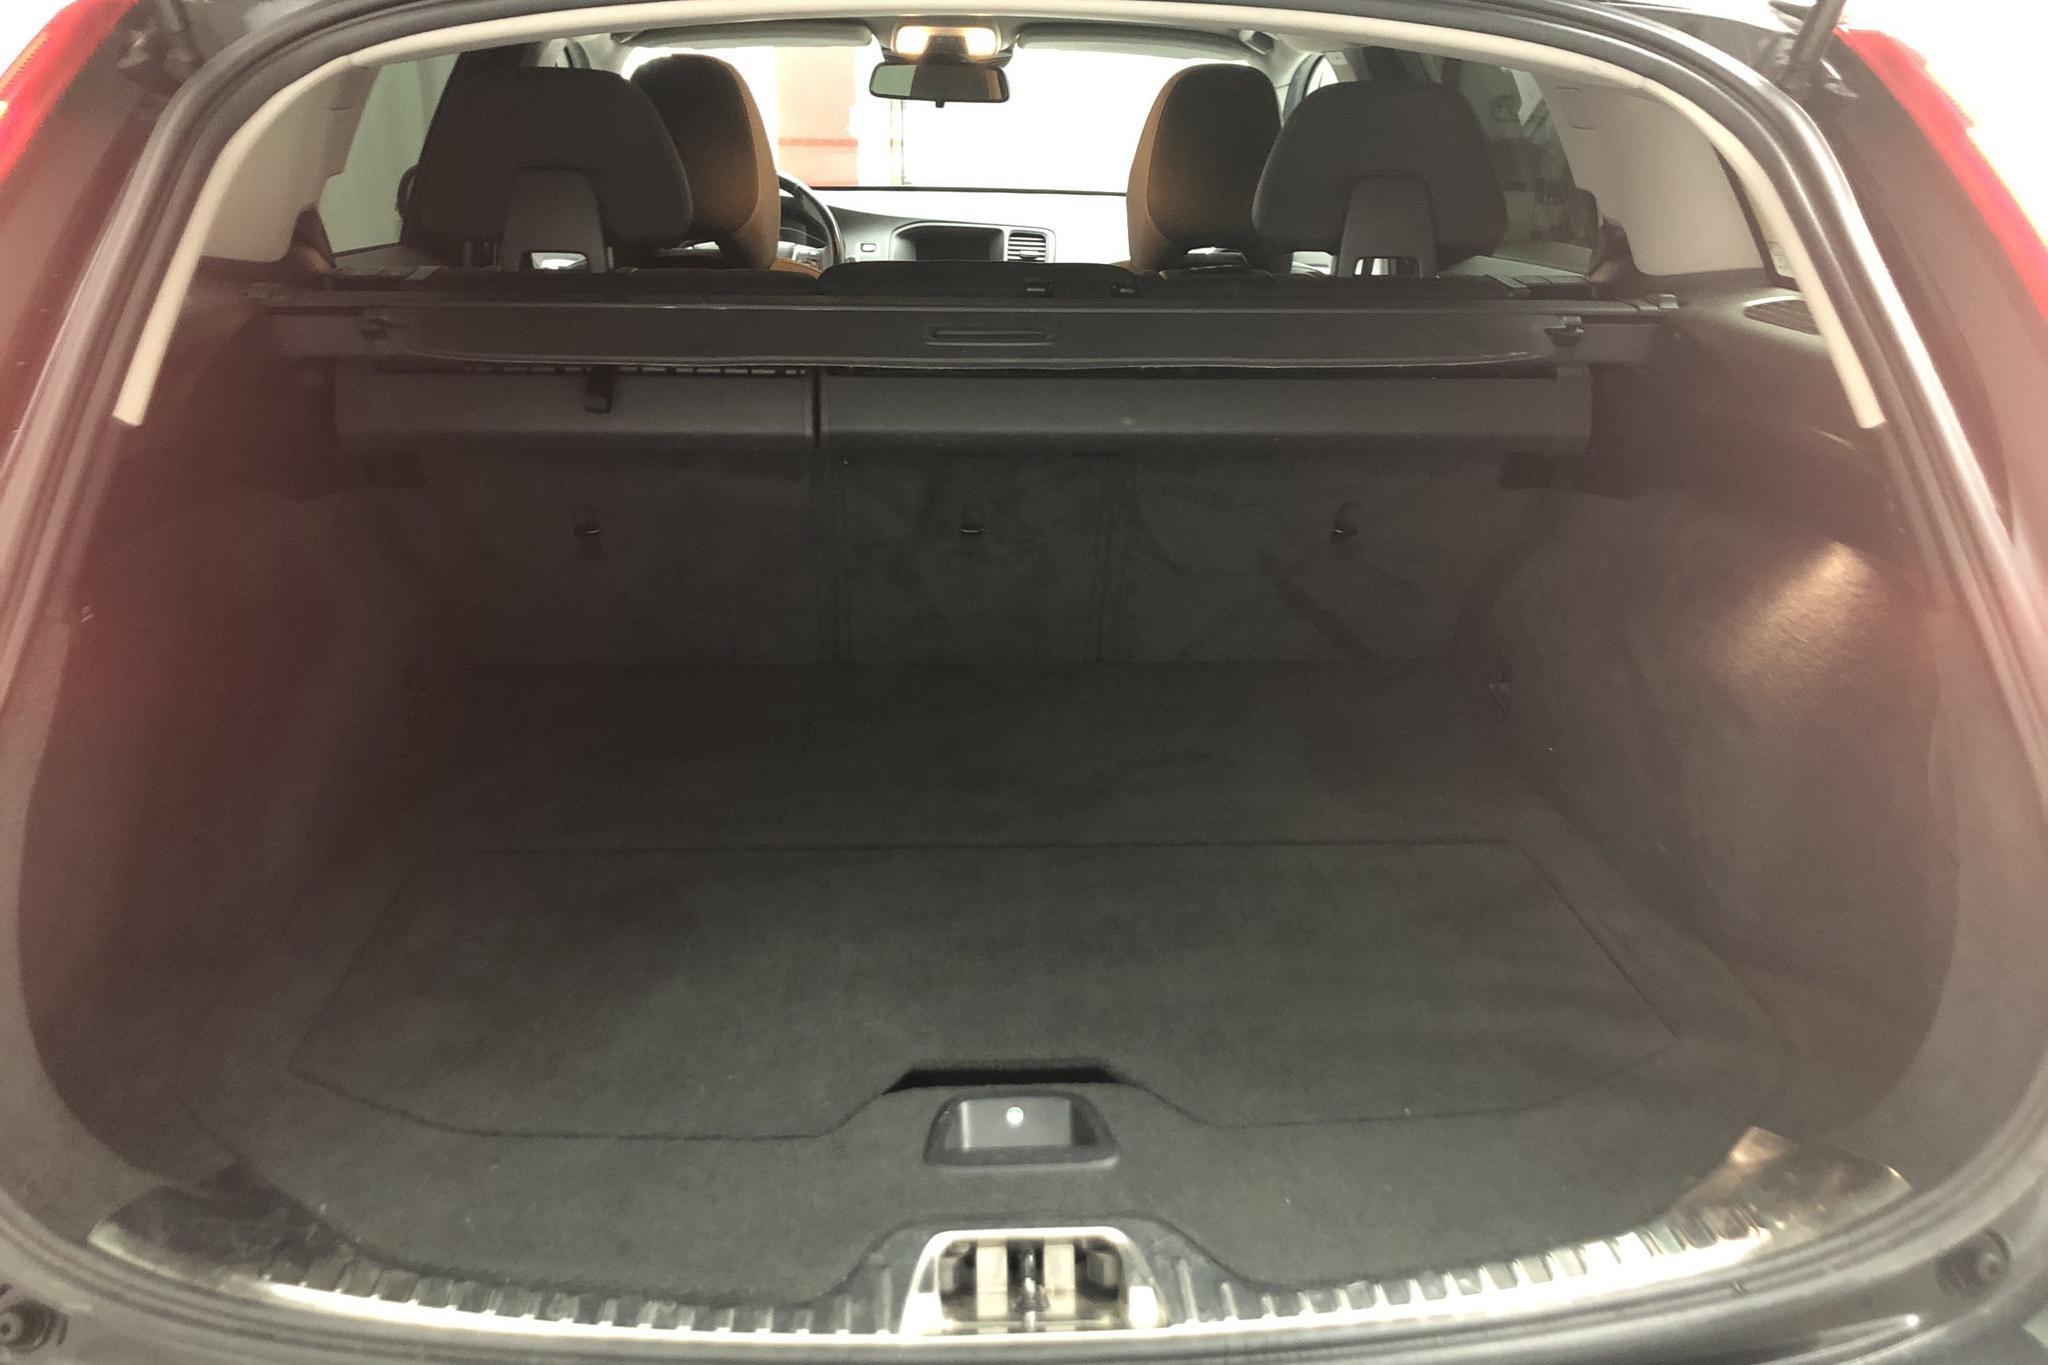 Volvo V60 D4 AWD (181hk) - 11 378 mil - Automat - svart - 2015